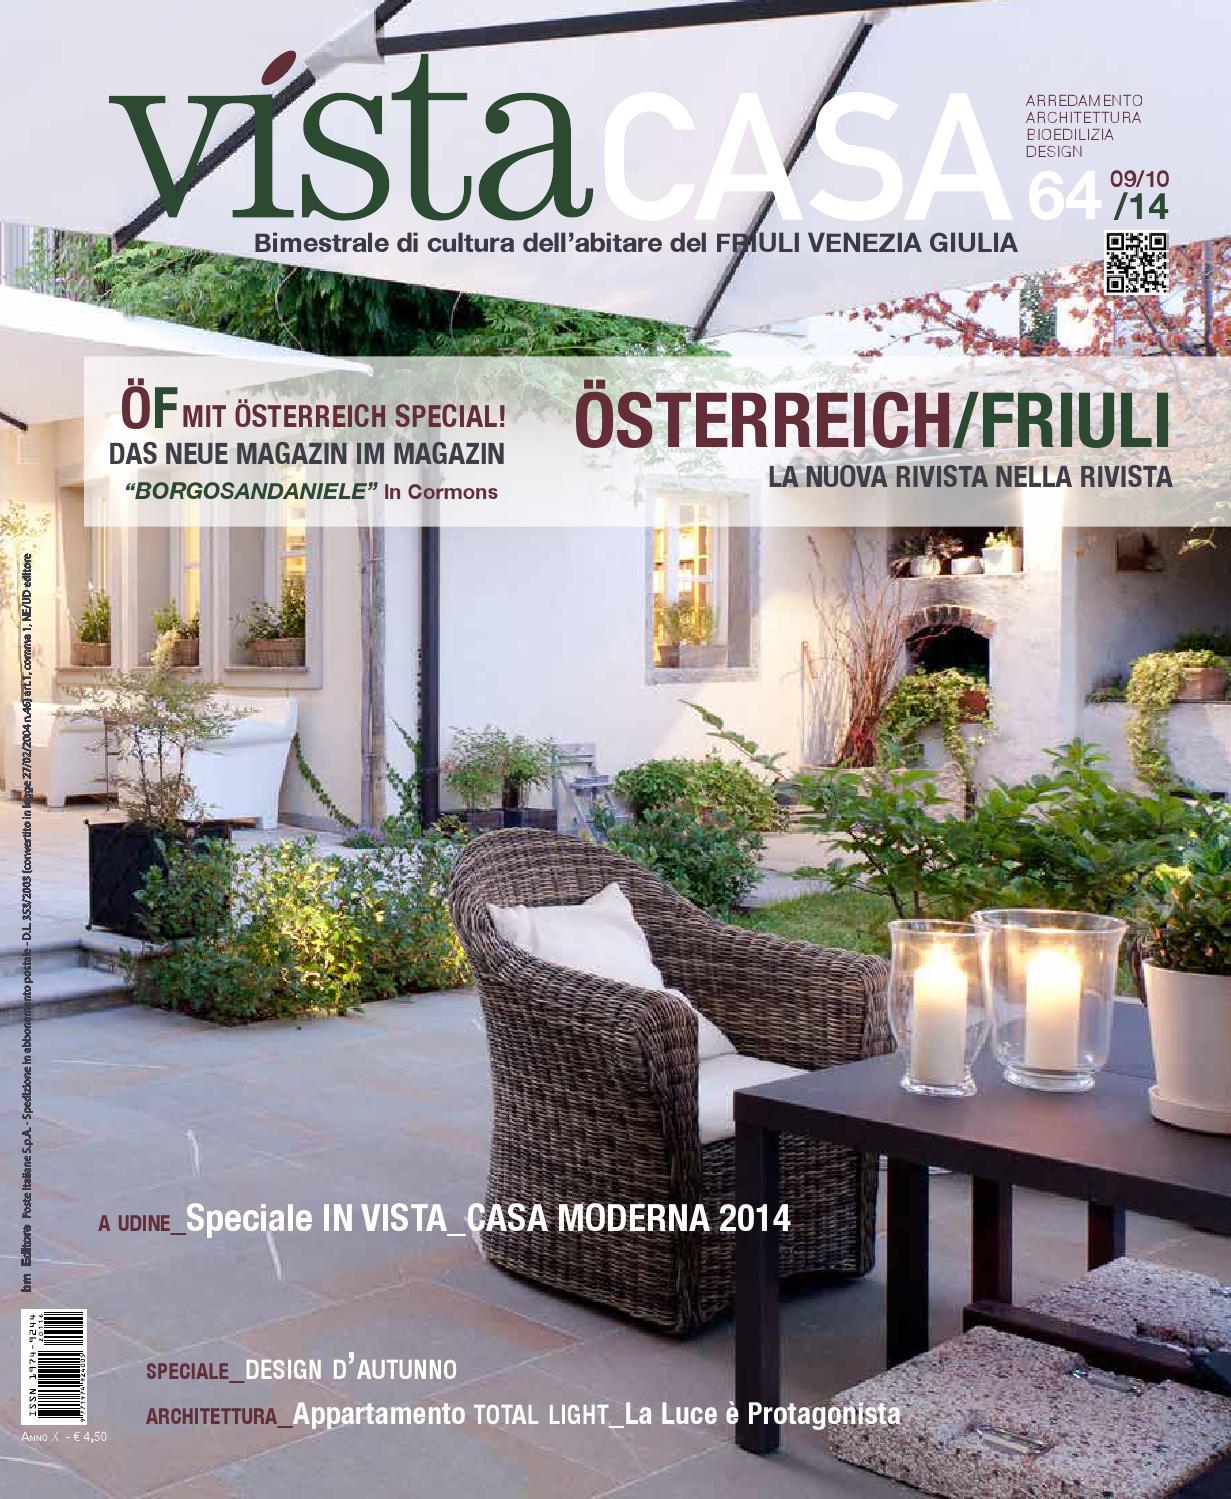 Friuli Venezia Giulia Arredamento.Vistacasa N 64 By Vistacasa By Bm Editore Issuu